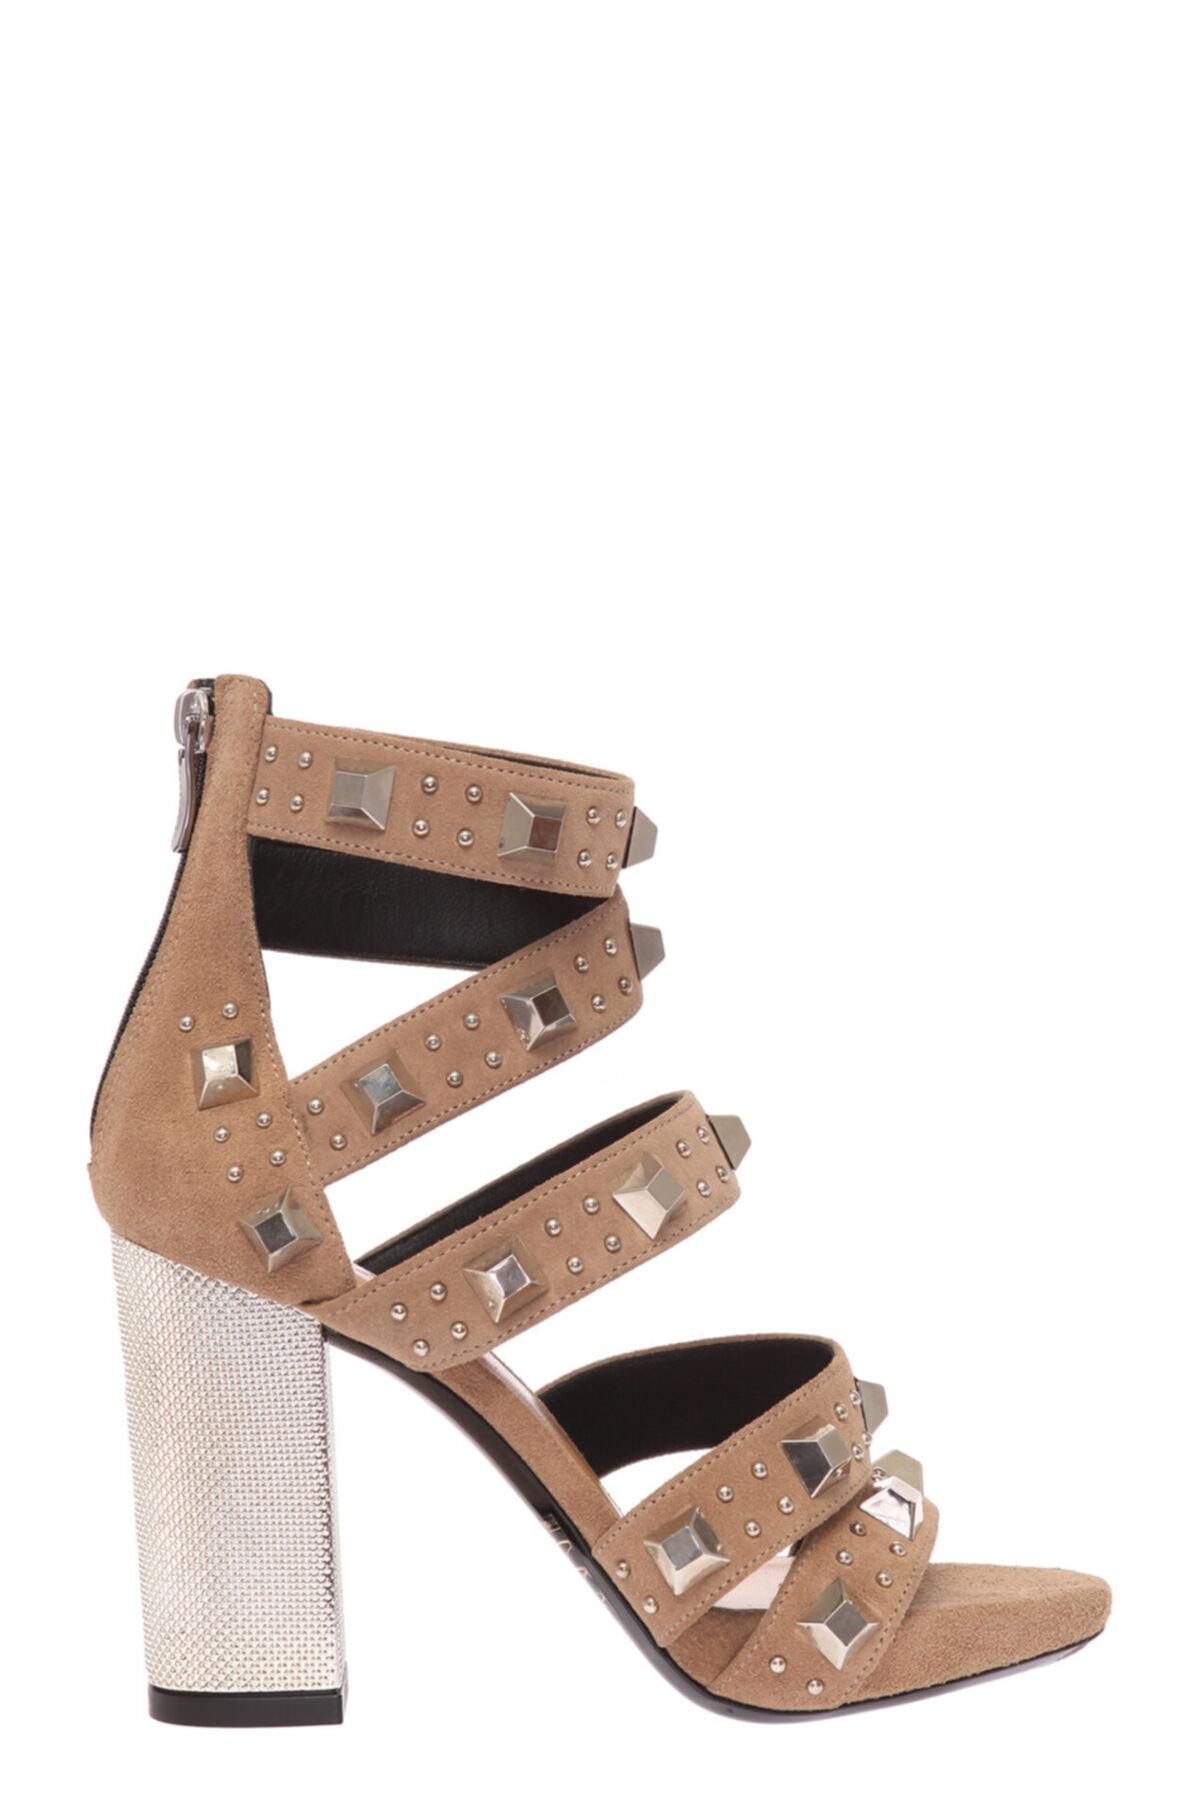 Barbara Bui Bej Sandalet 1